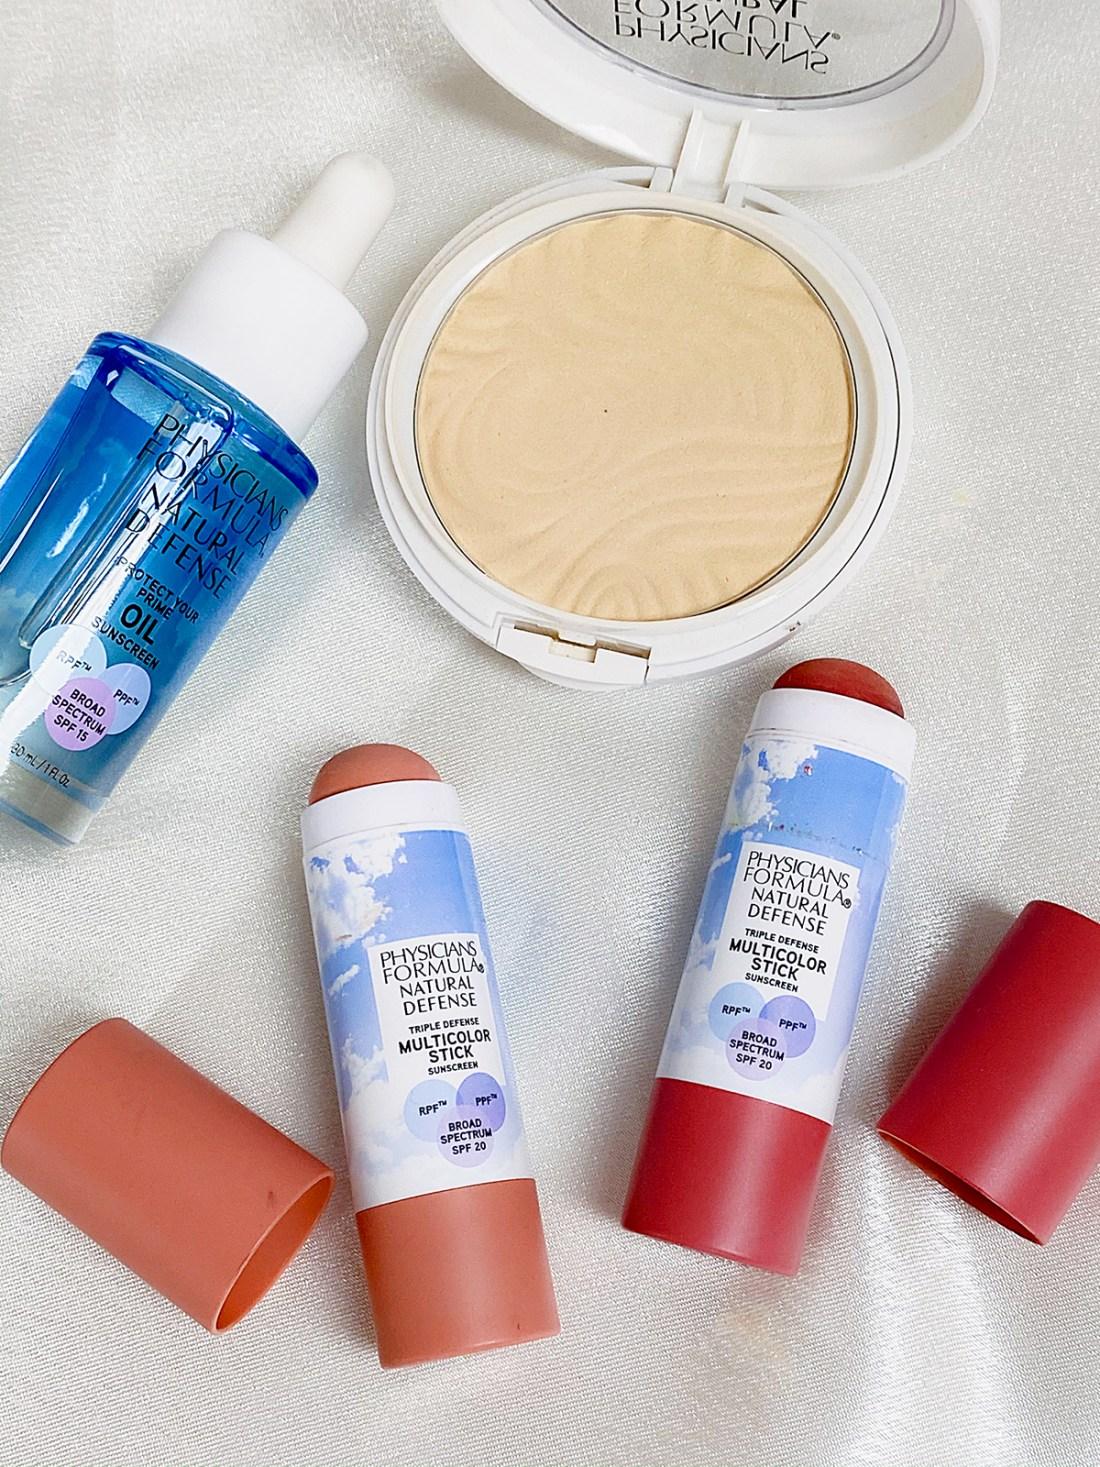 Physicians Formula Natural Defense Makeup | A Good Hue